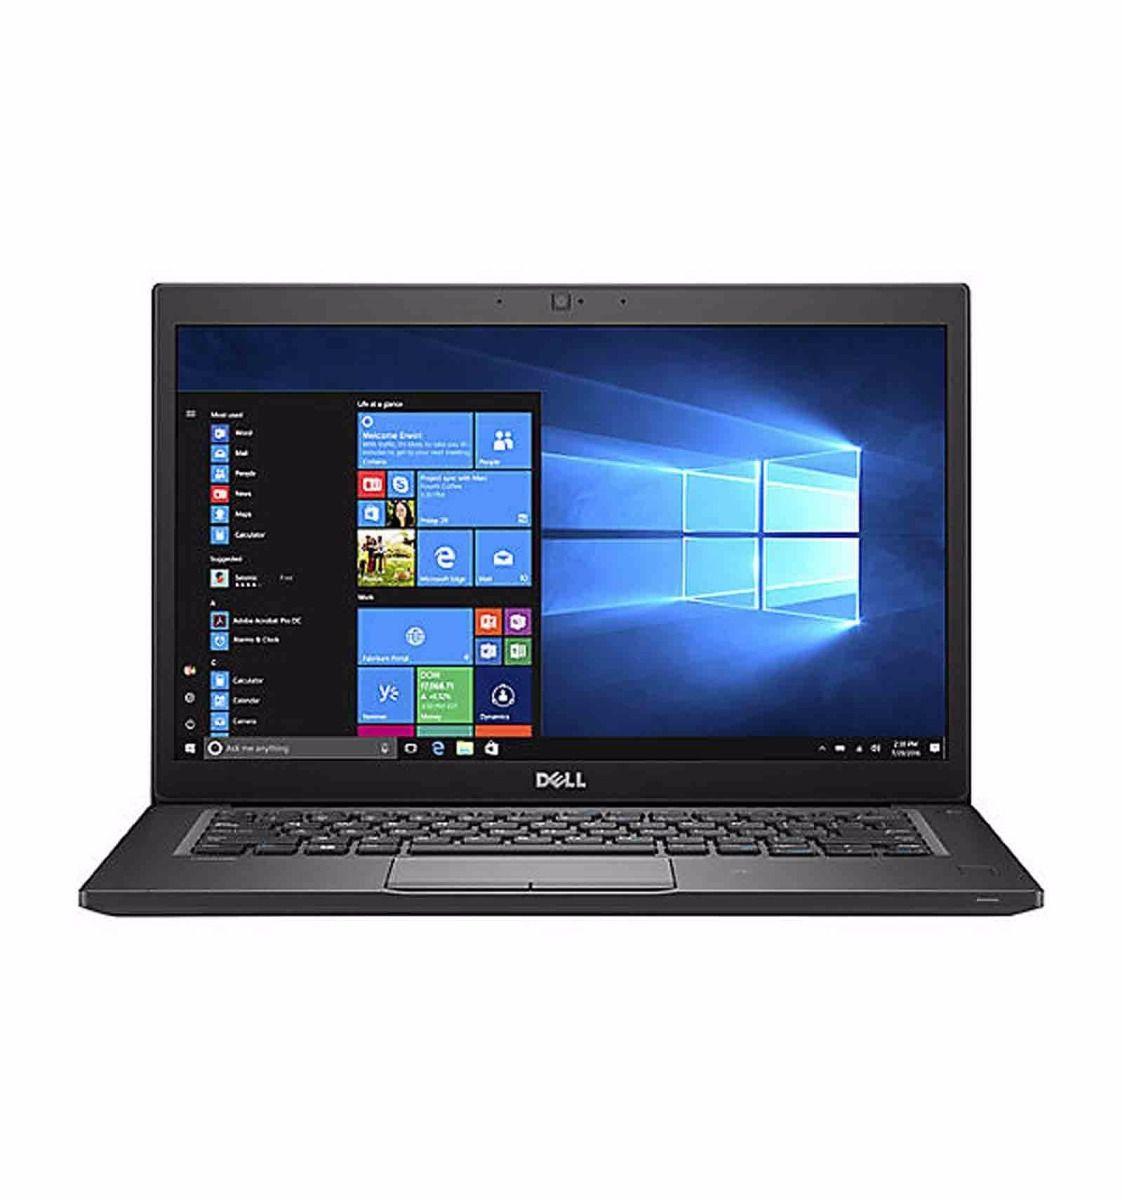 Notebook Dell Vostro 3468 i3-6006U| 4GB DDR4| HD 500| DVD| 14.0 HD| Win10 Pro